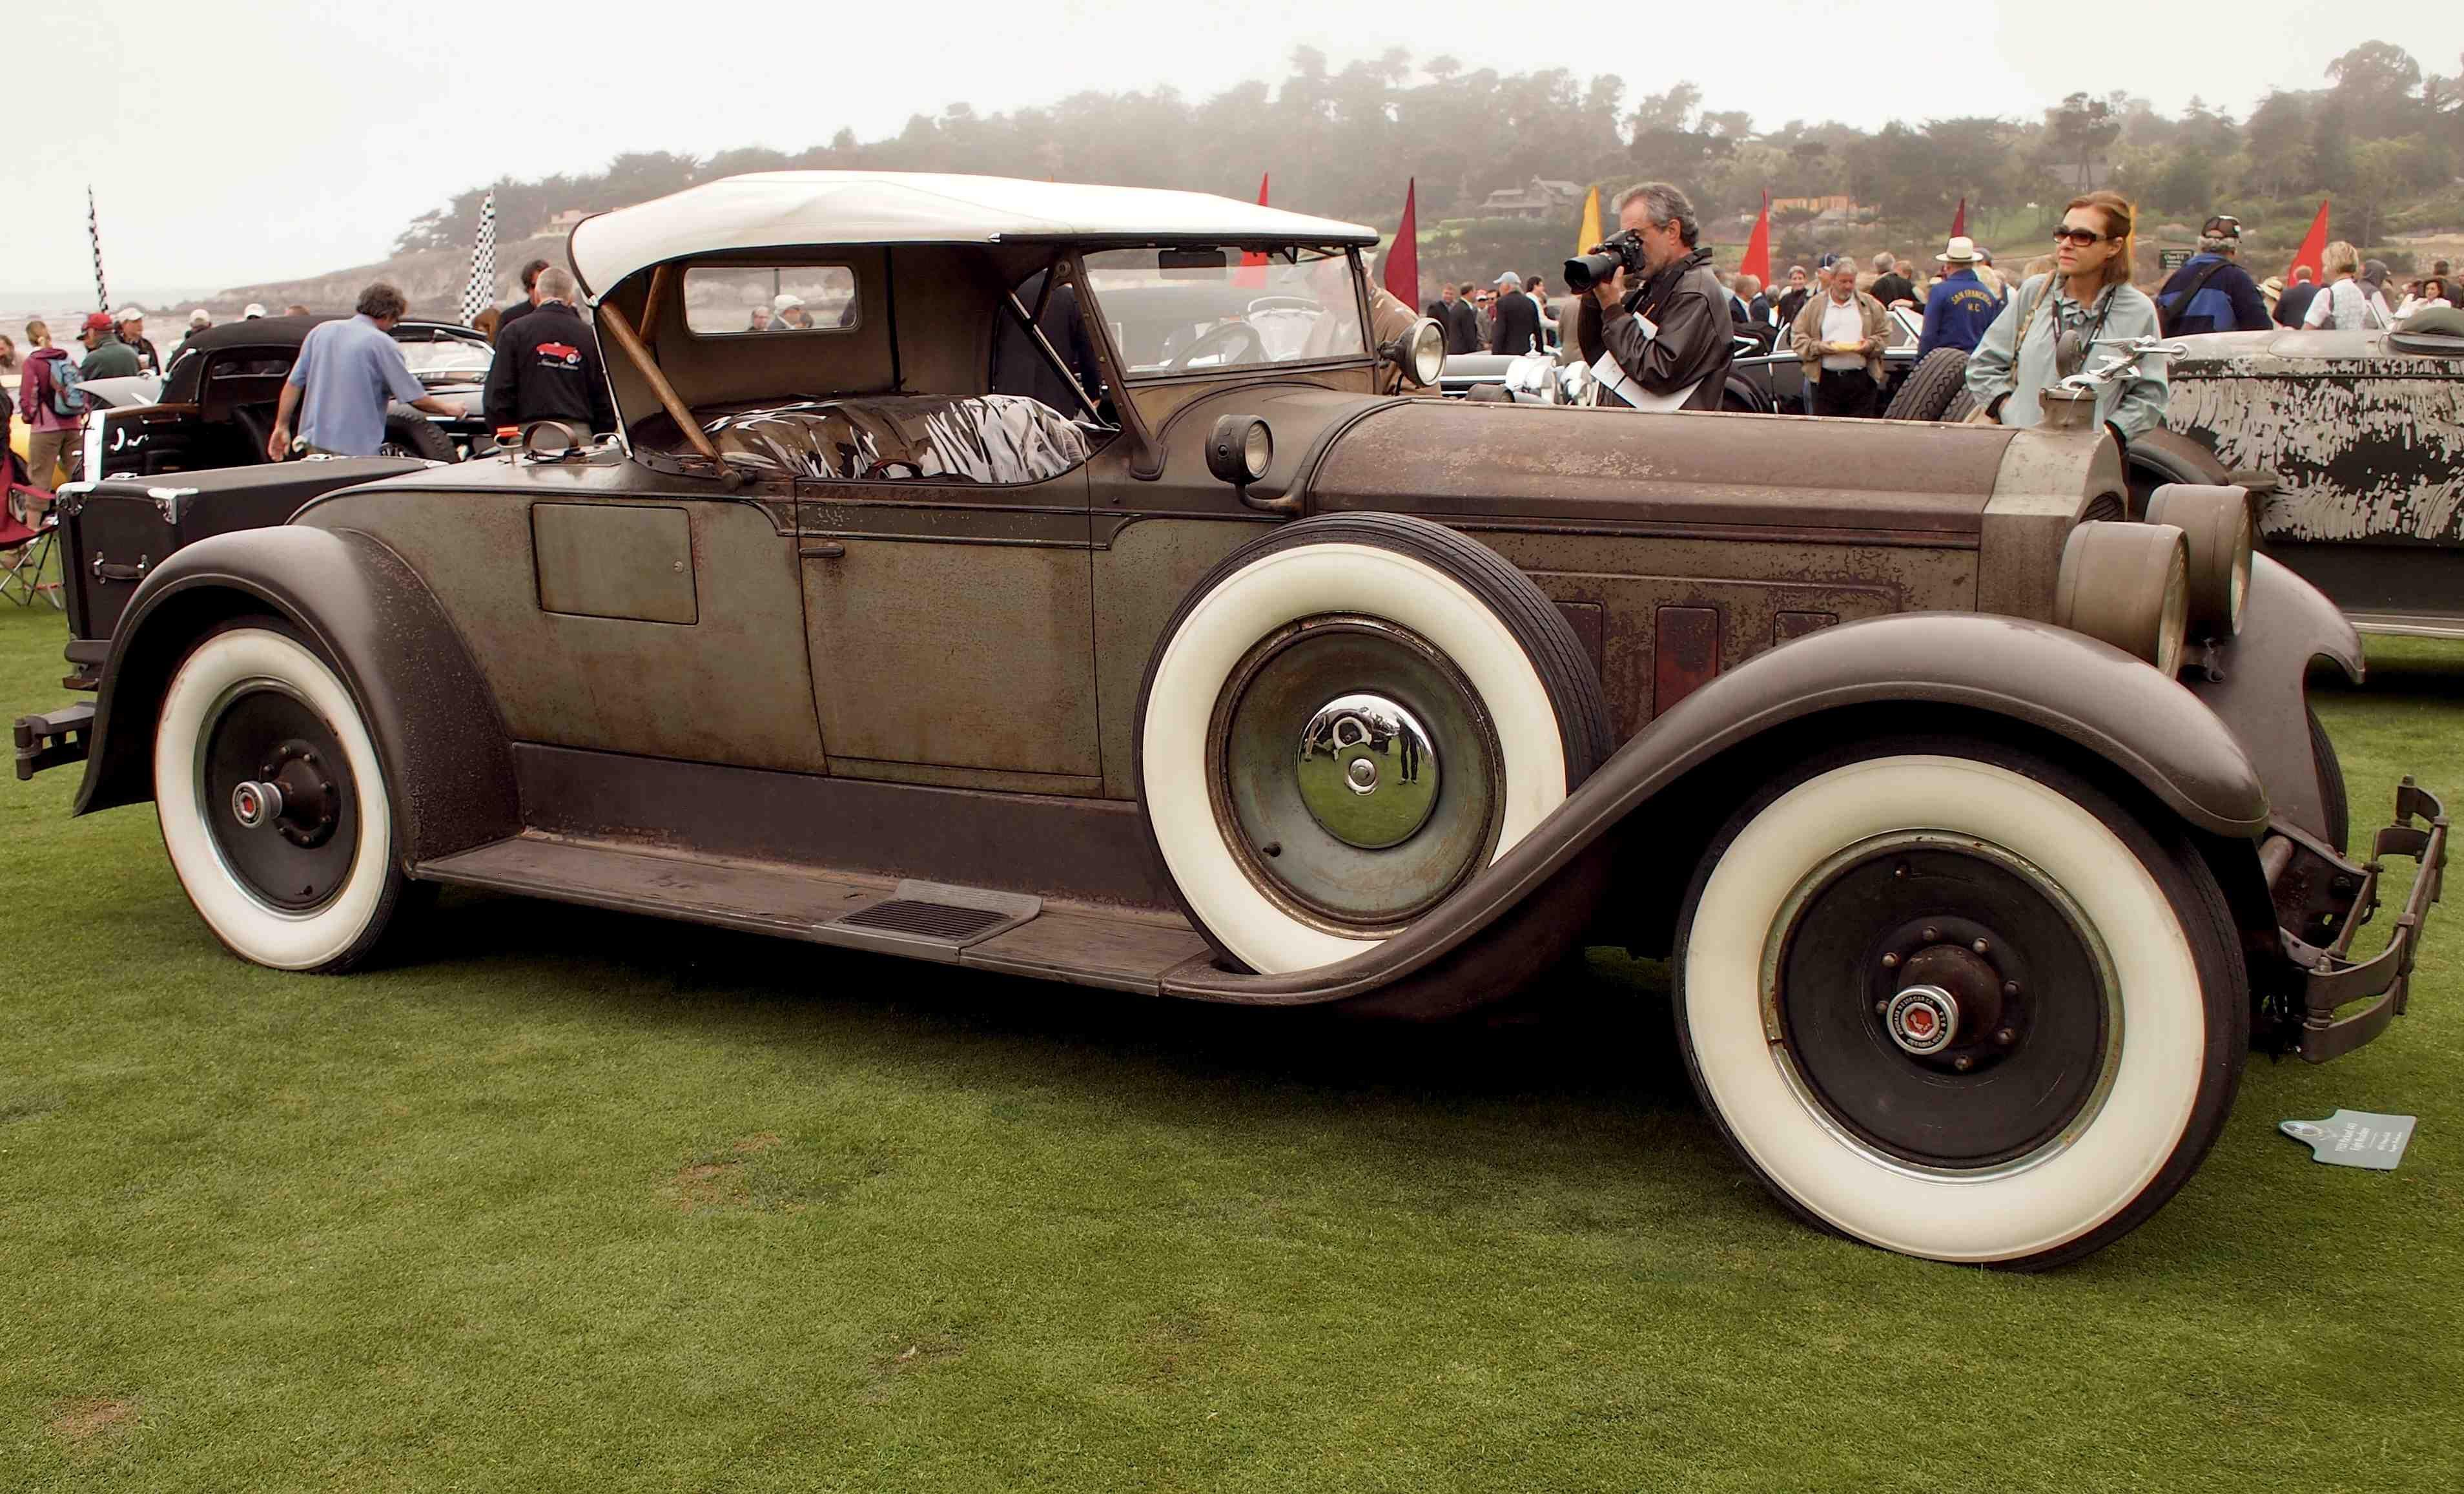 Packard 1928 Packard 443 Eight Cylinder Roadster In The Pre War Preservation Packard Vintage Cars Motor Car